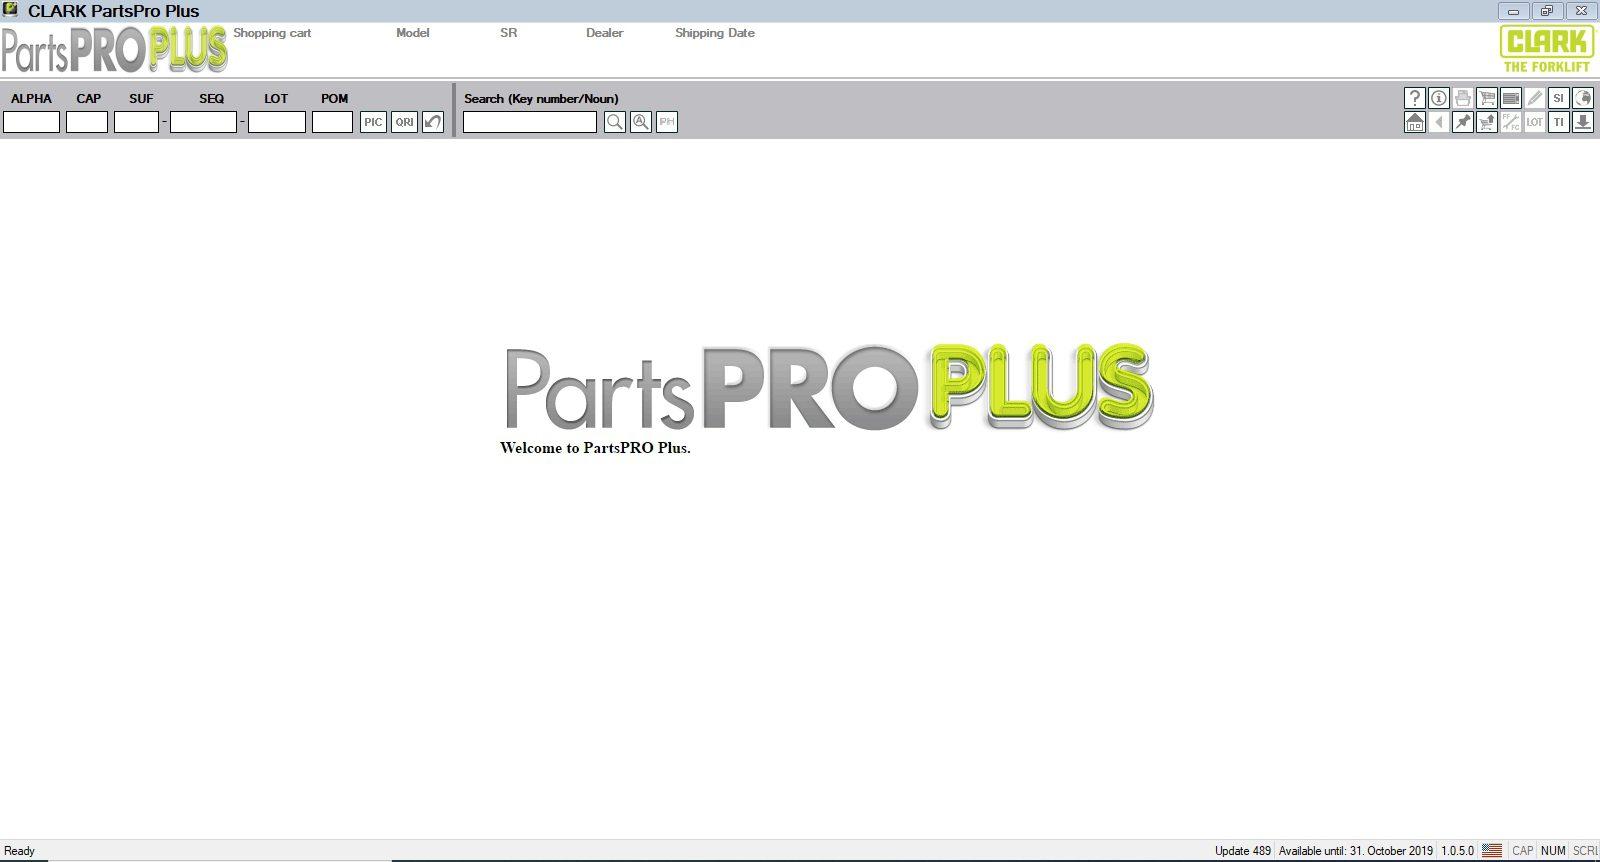 Clark_ForkLift_Parts_Pro_Plus_v489_082019_1 (1)